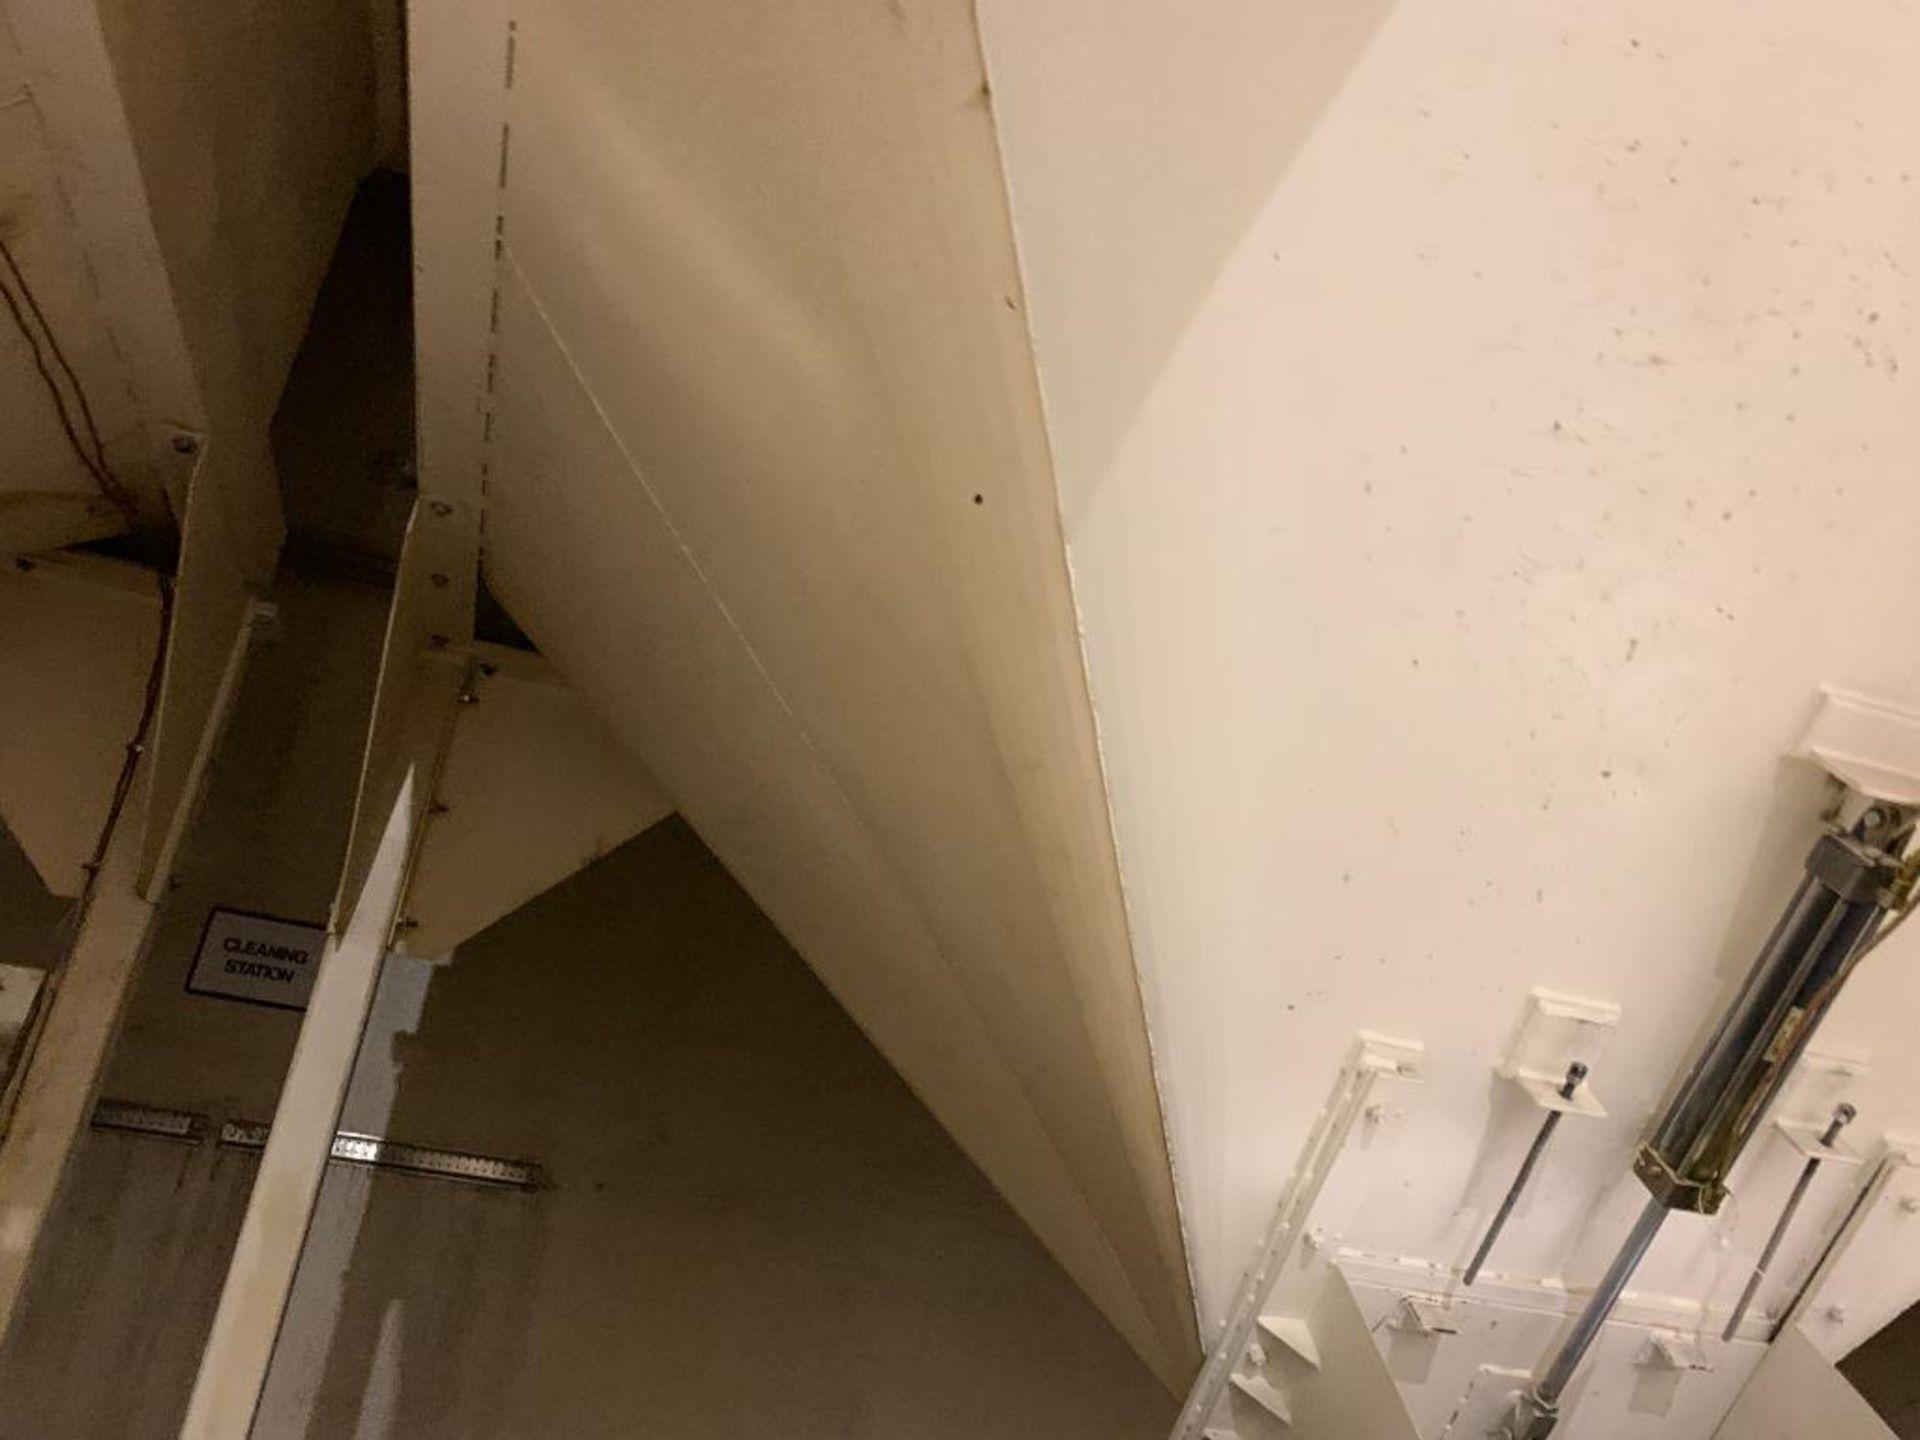 Aseeco mild steel cone bottom bulk storage bin - Image 17 of 25